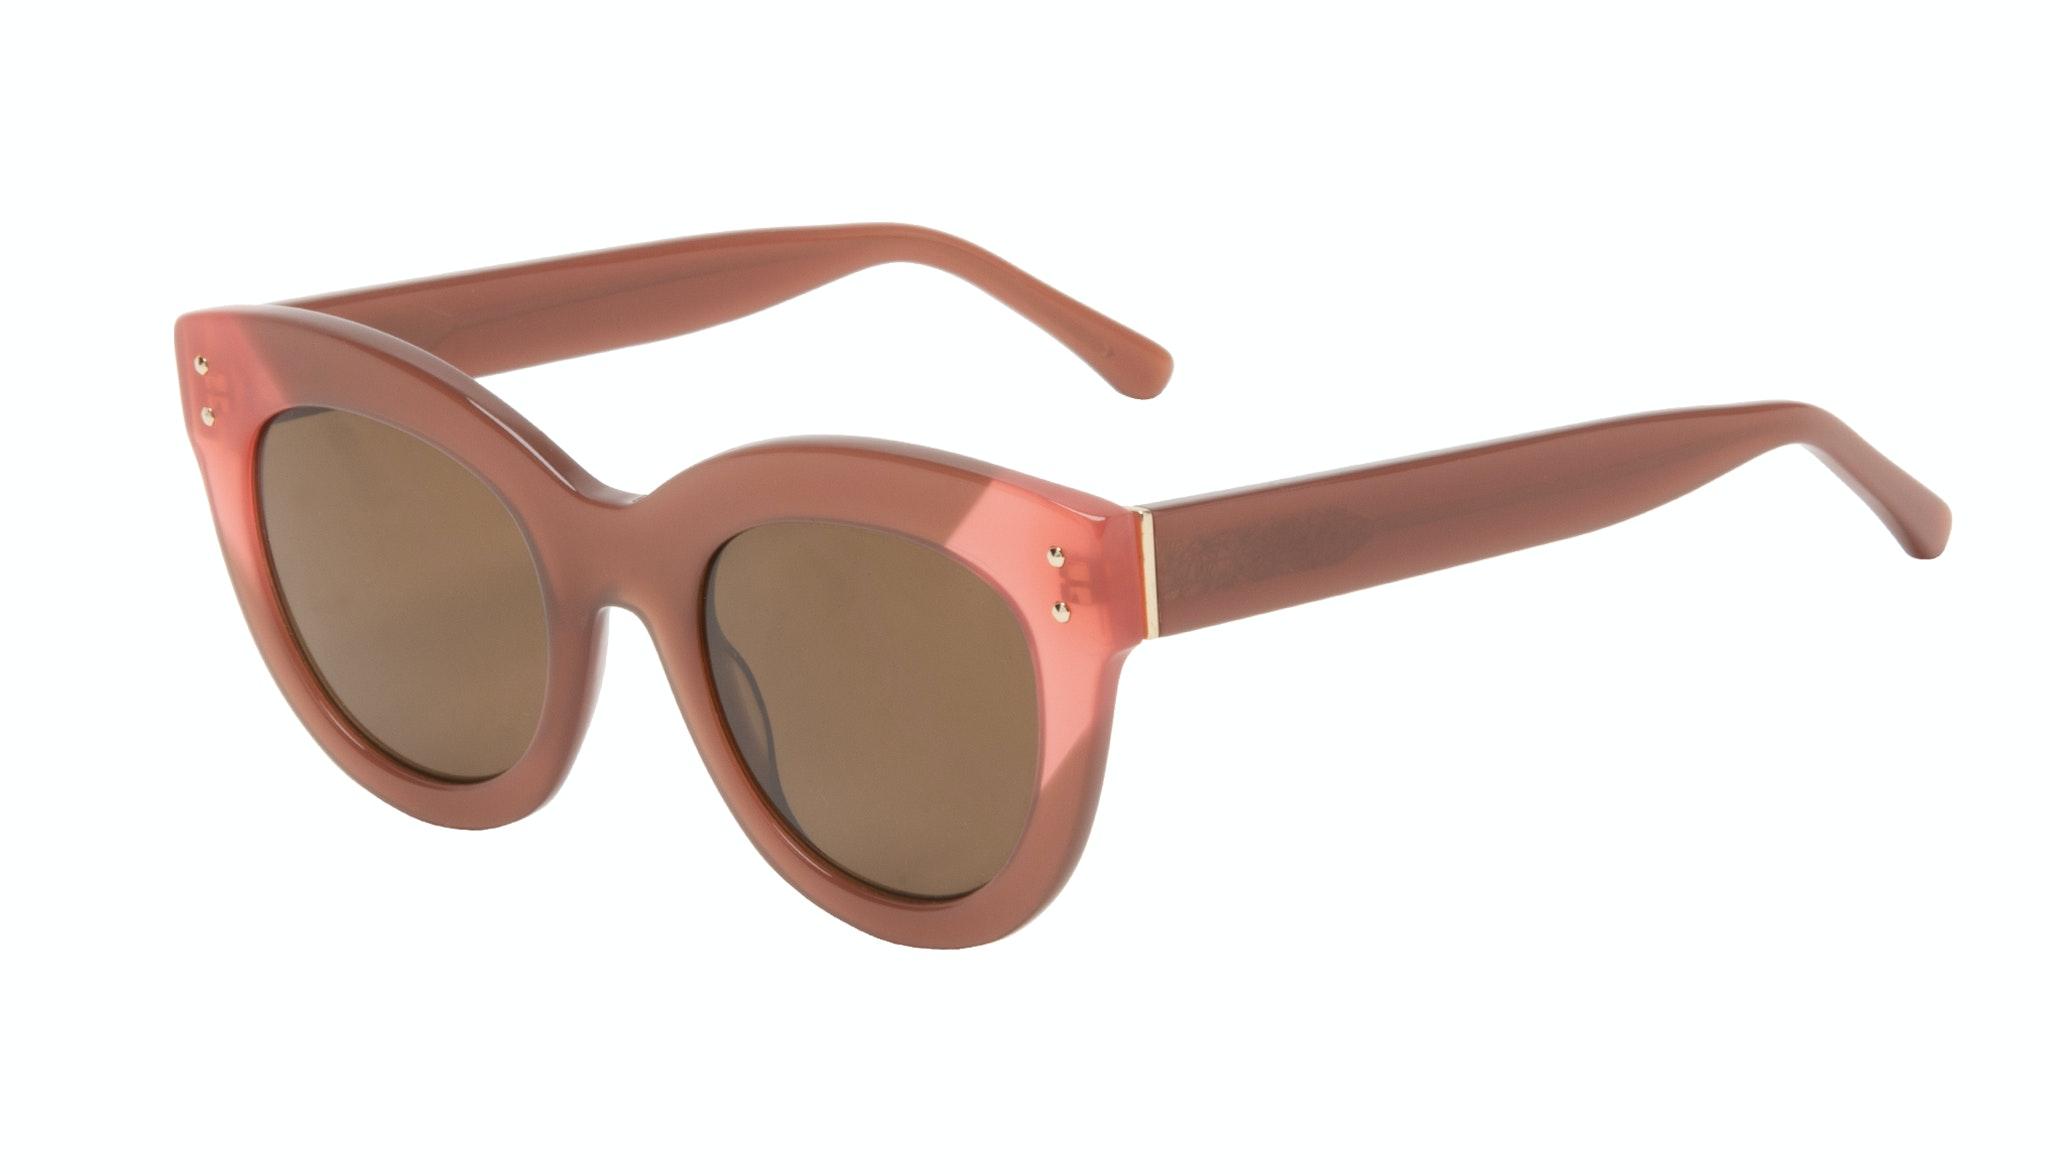 Affordable Fashion Glasses Cat Eye Sunglasses Women Groove Toffee Tilt